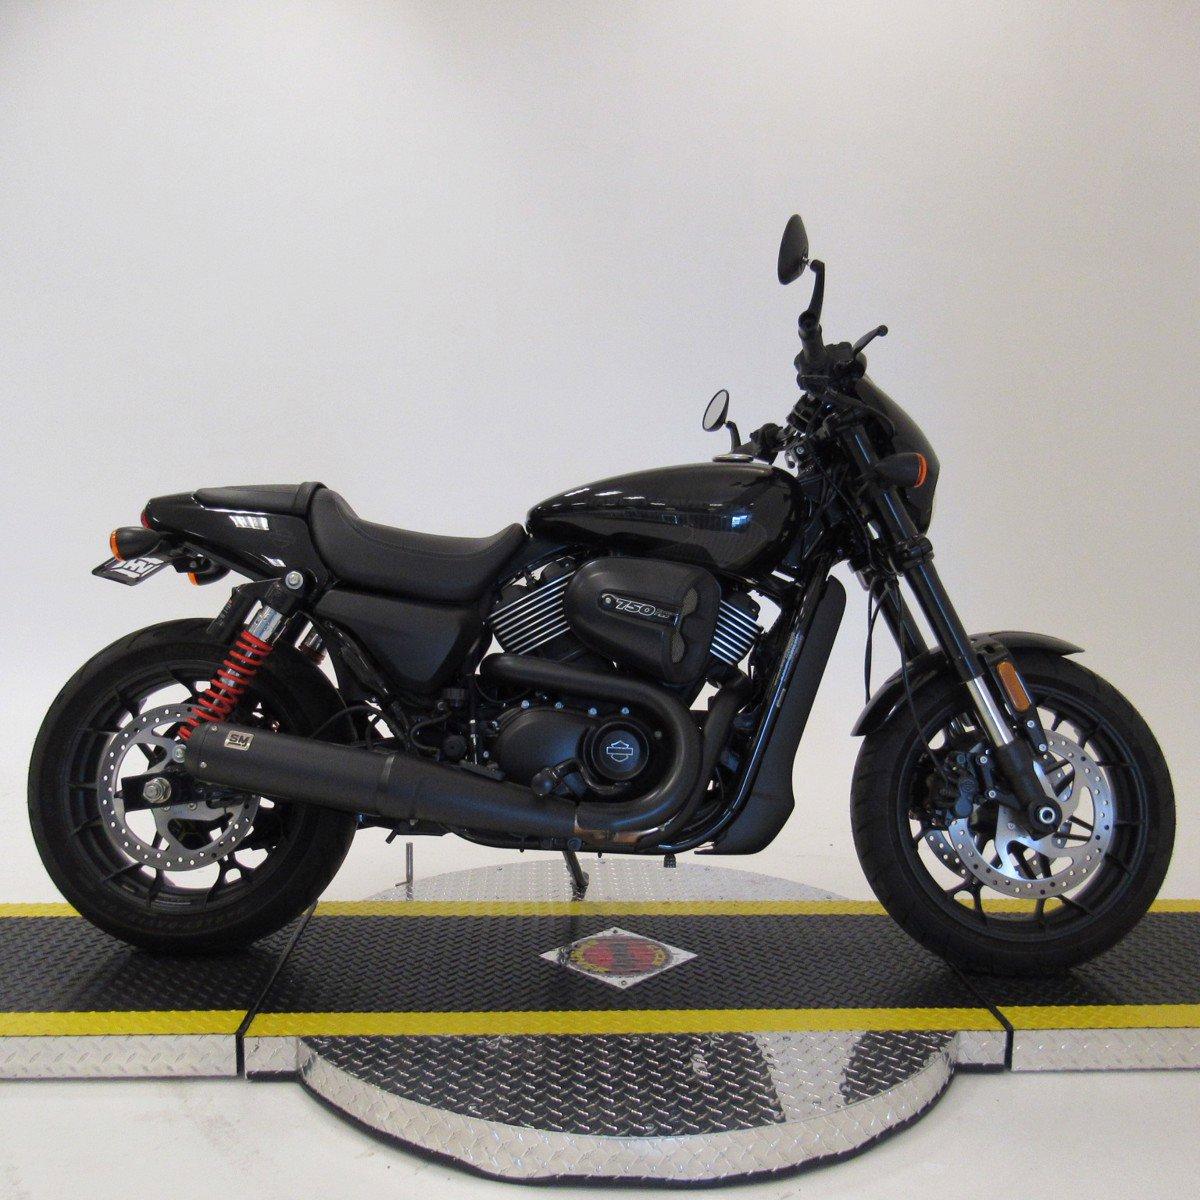 Pre-Owned 2017 Harley-Davidson Street Rod XG750A